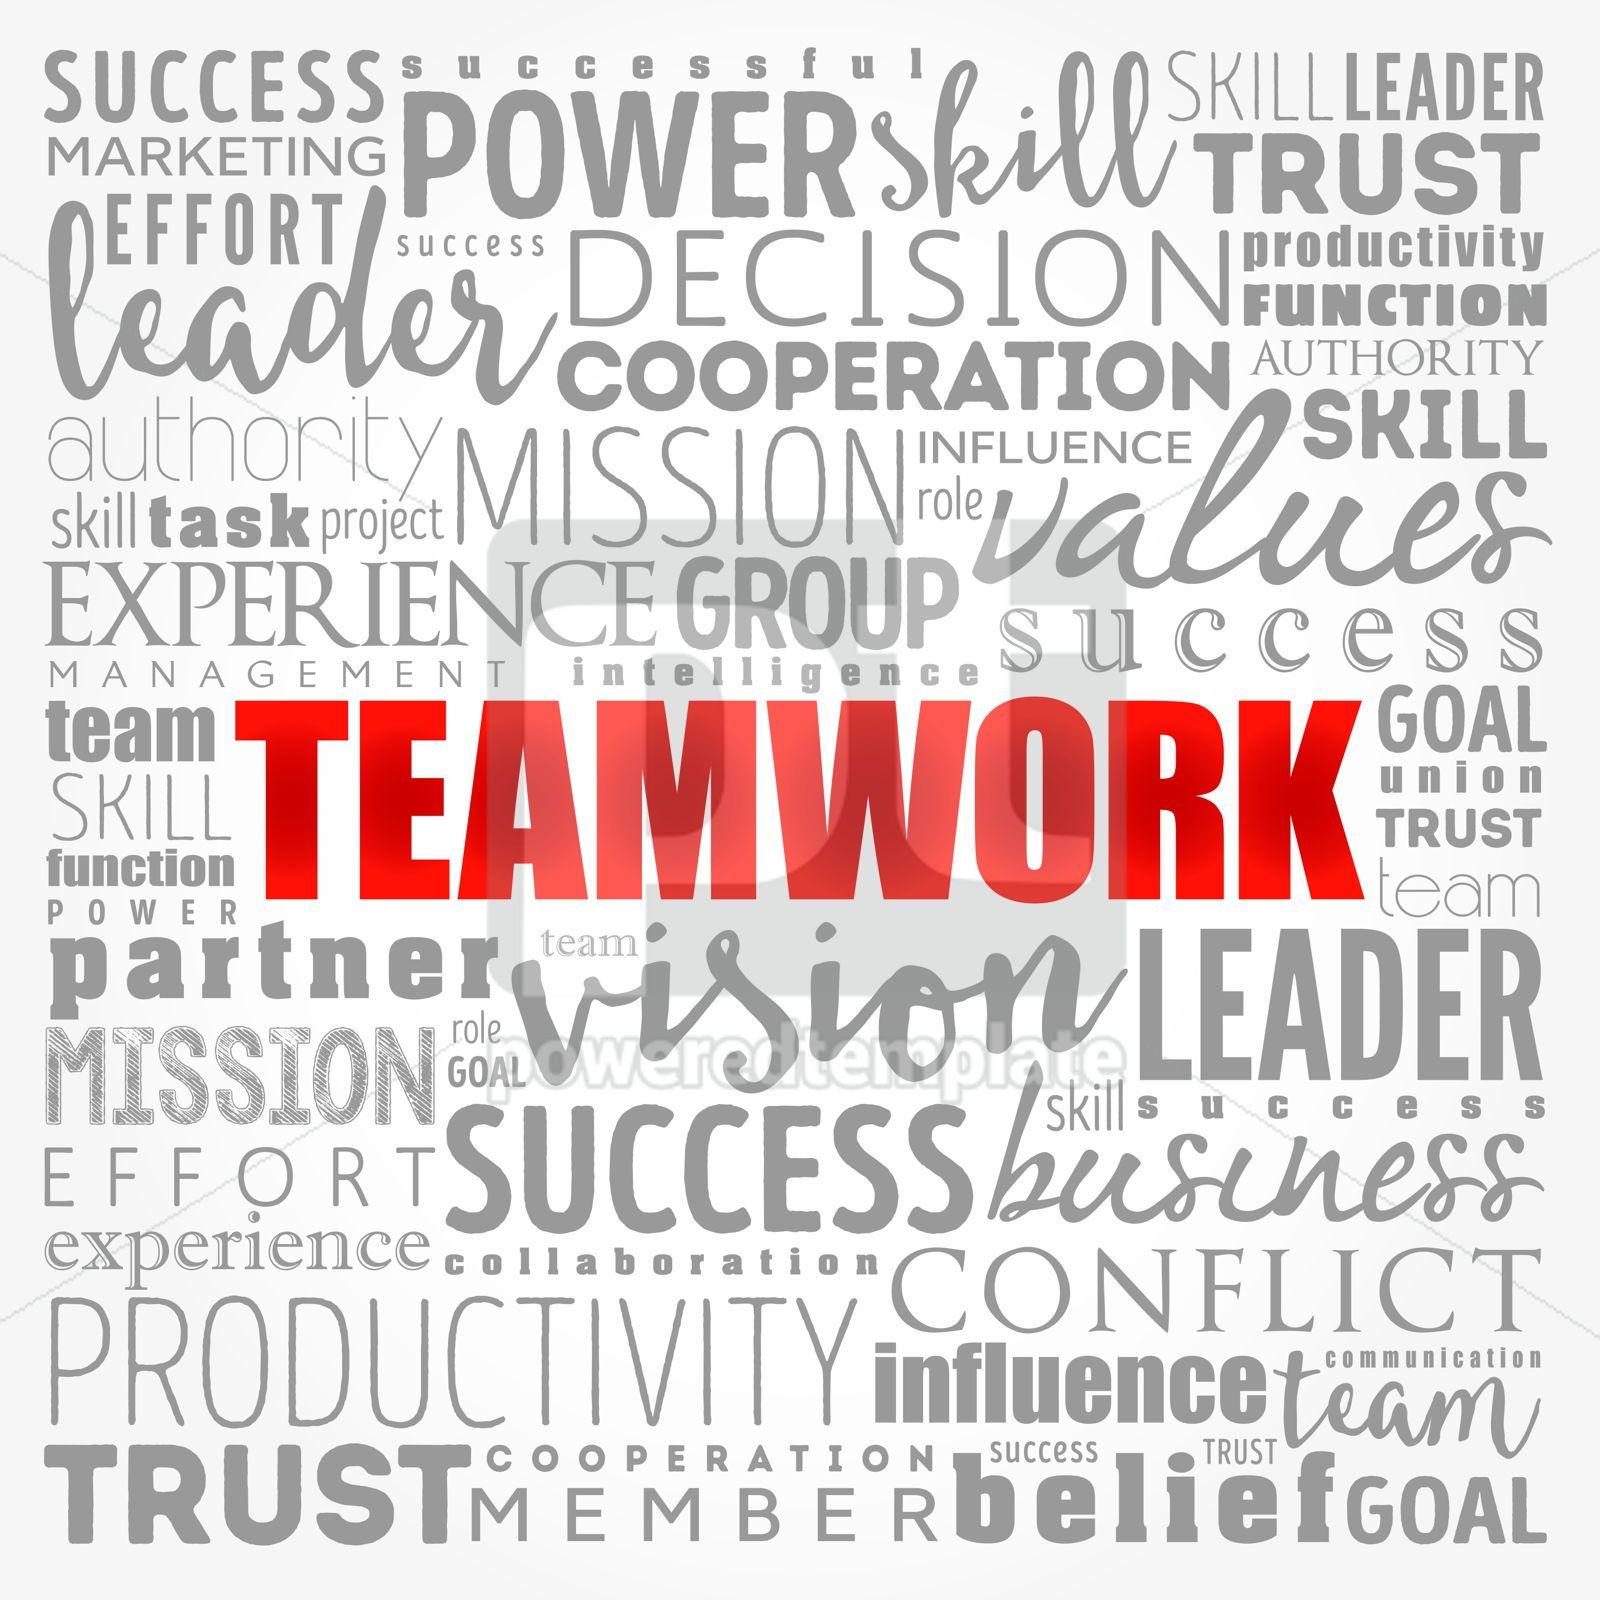 TEAMWORK word cloud collage business concept background, 17330, Business — PoweredTemplate.com